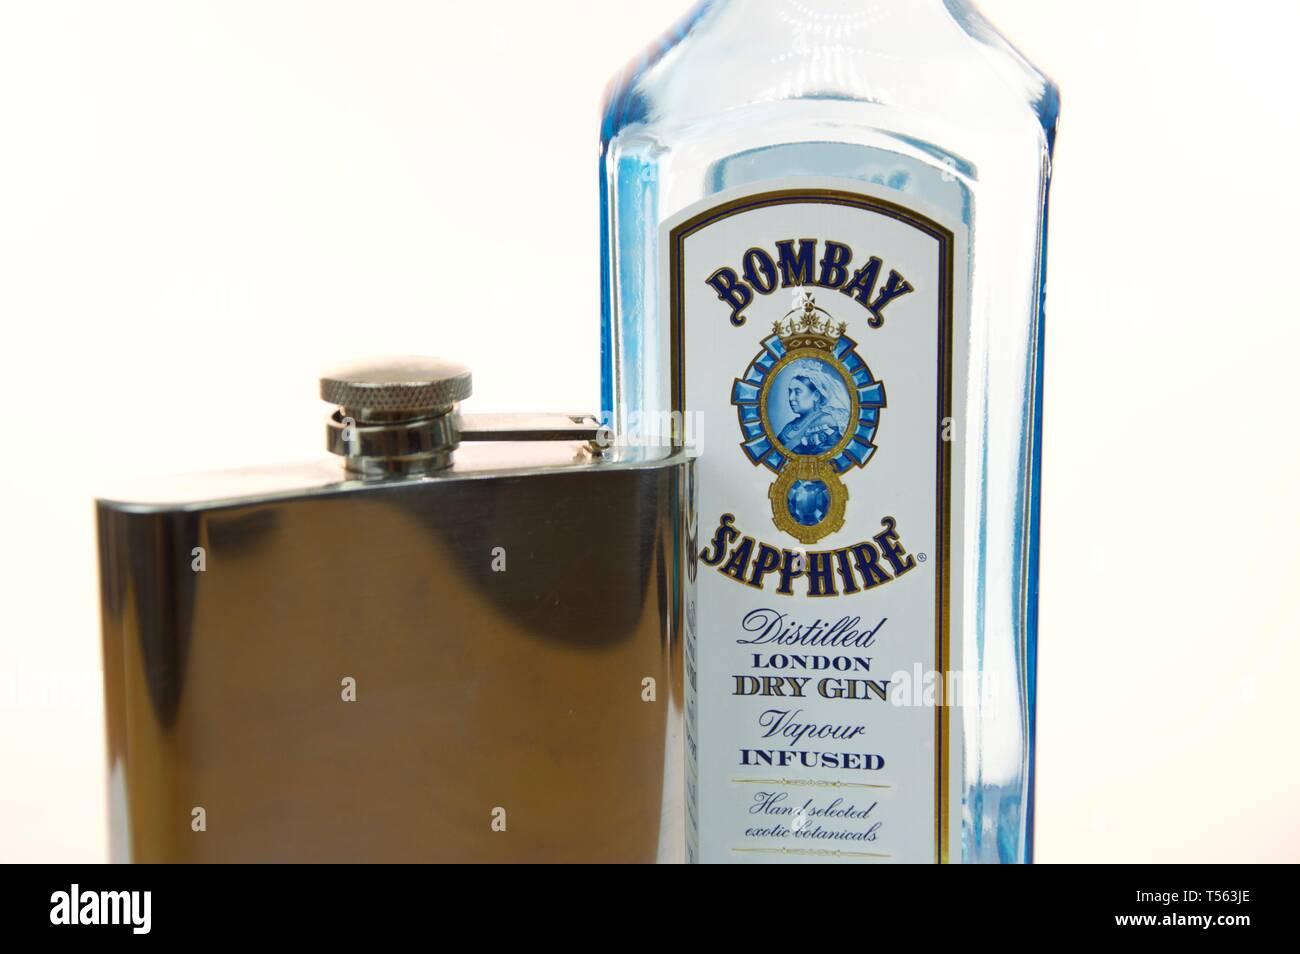 Gin On Display Imágenes De Stock & Gin On Display Fotos De